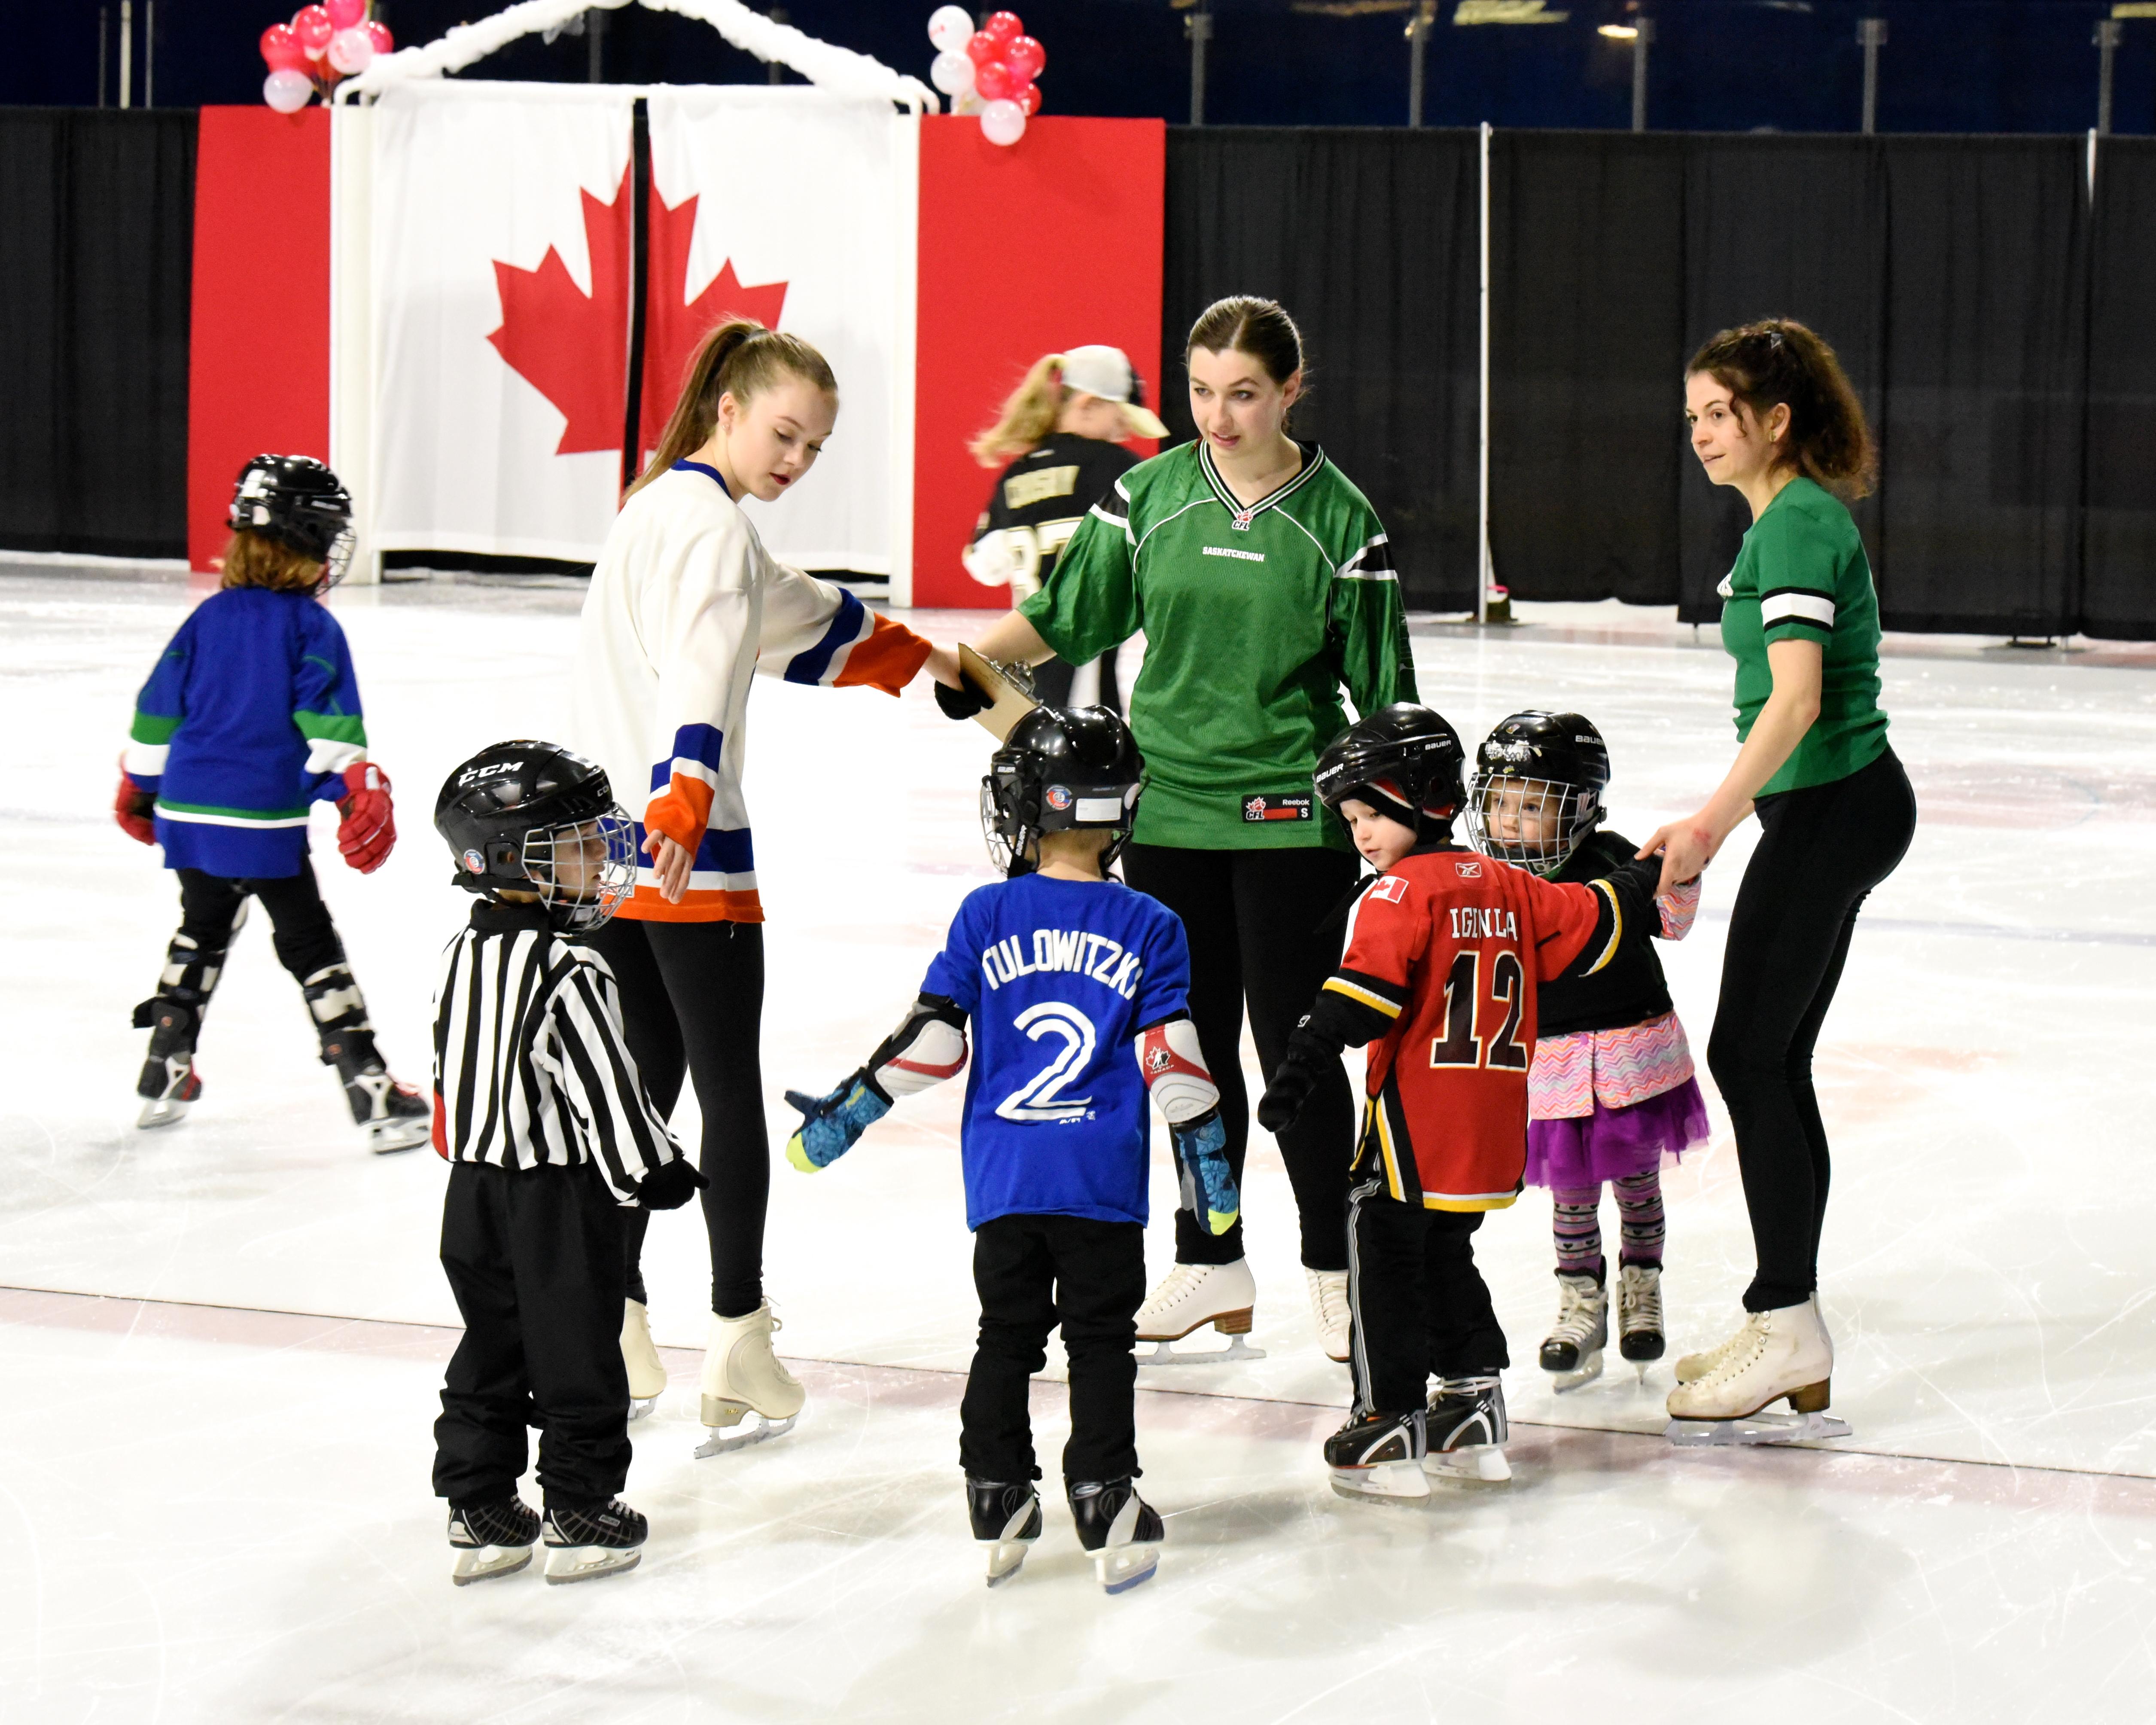 Where We Skate | Saskatoon Lions Speed Skating Club